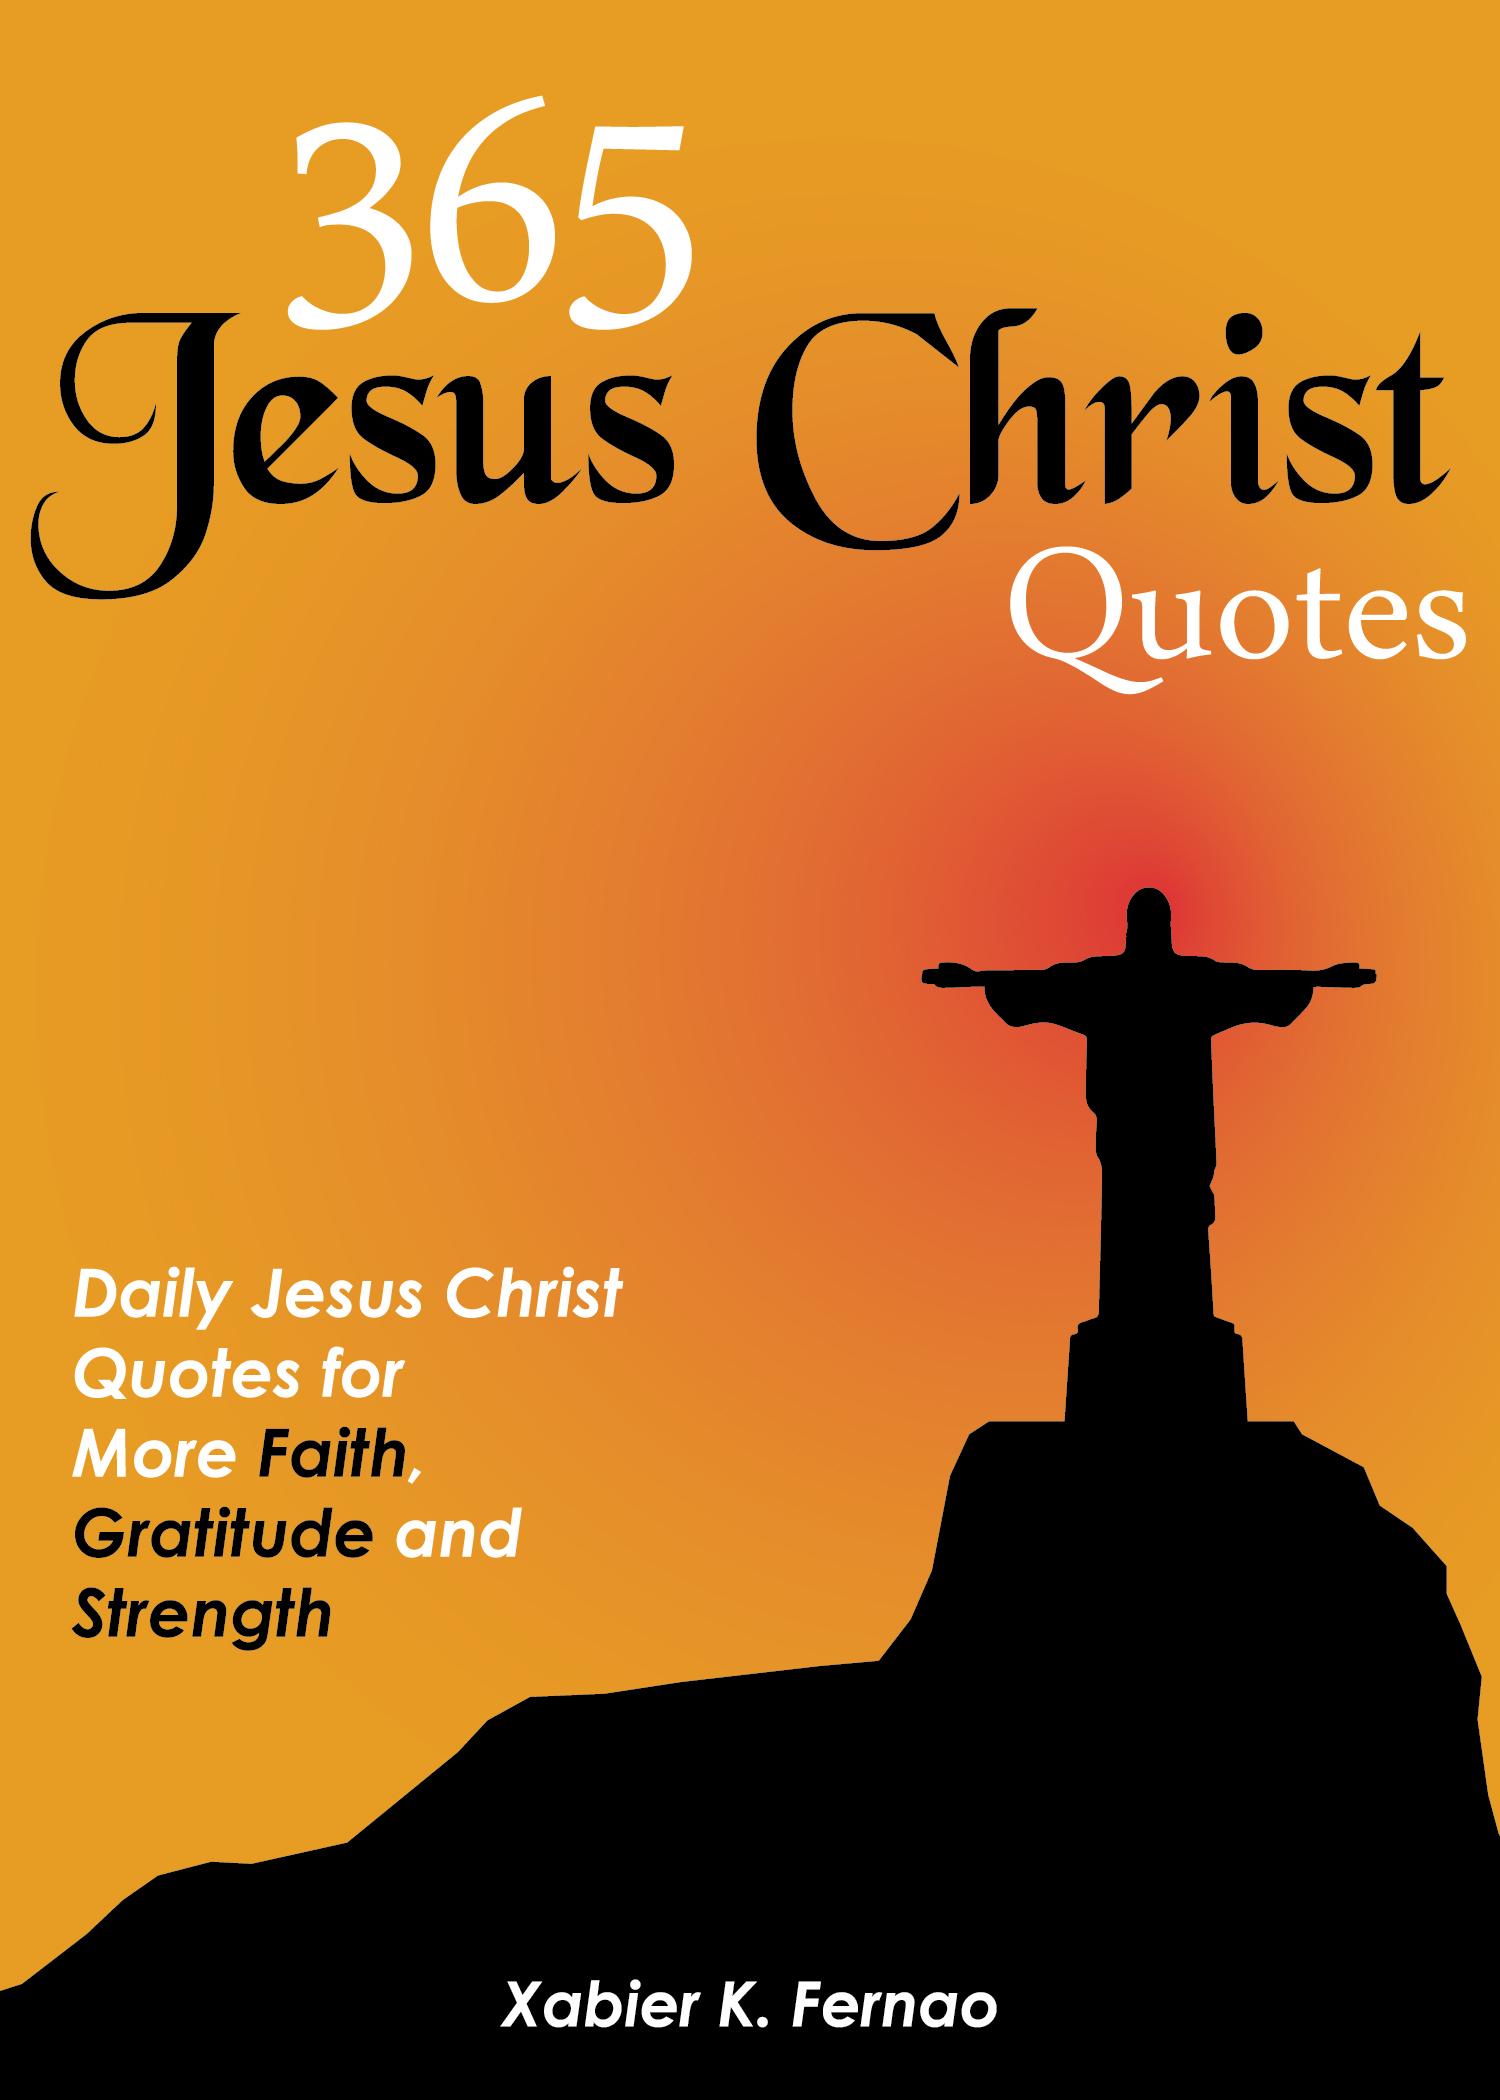 365 jesus christ quotes